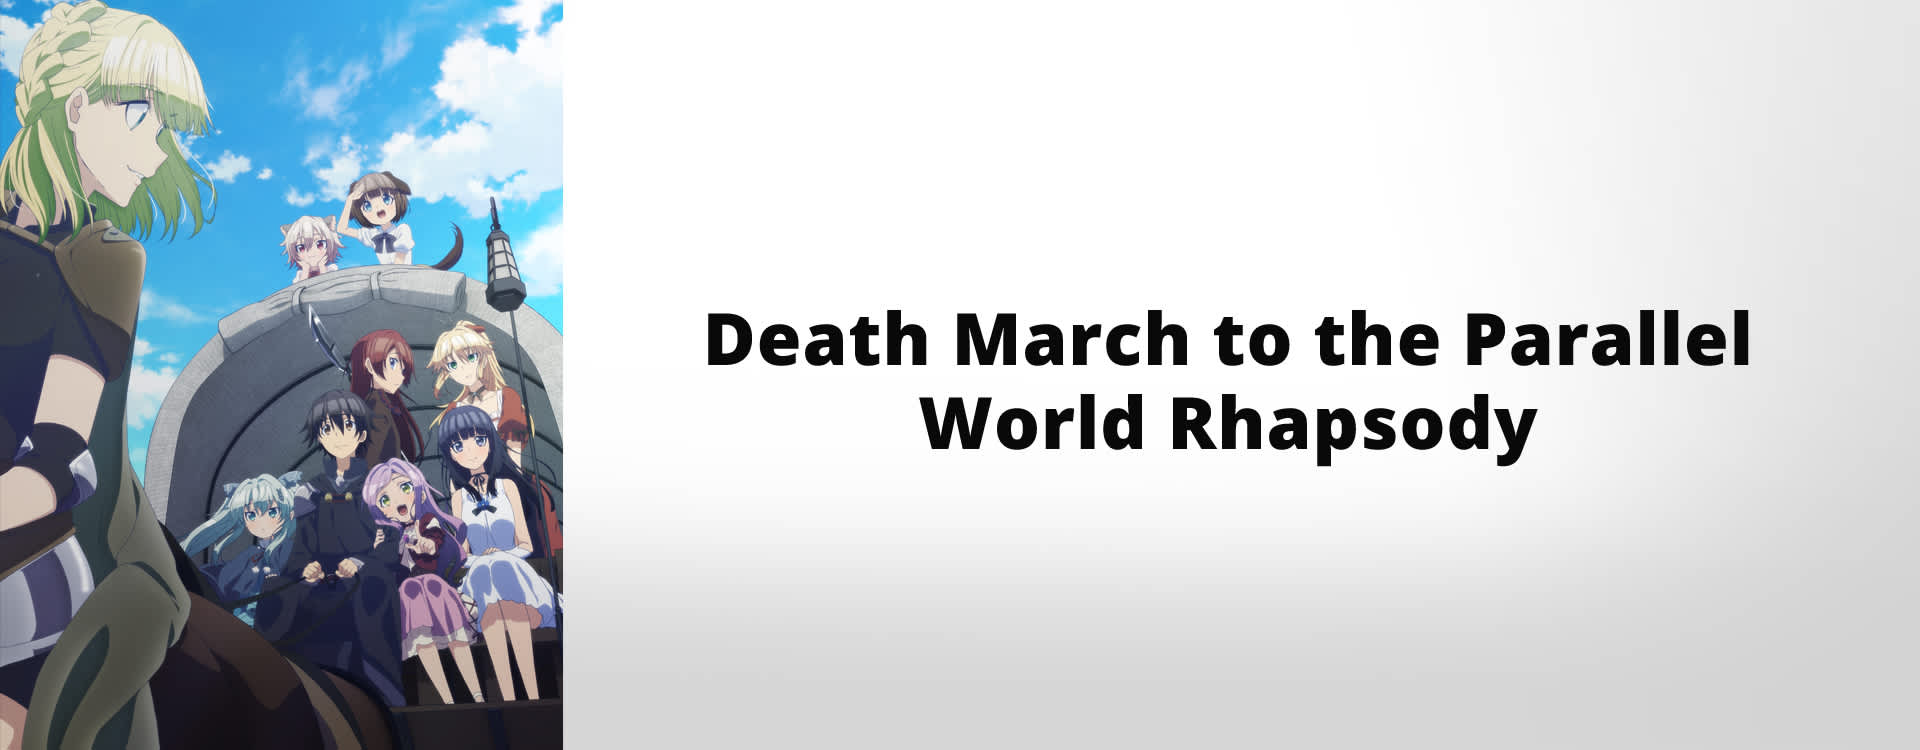 Stream Watch Death March To The Parallel World Rhapsody Episodes